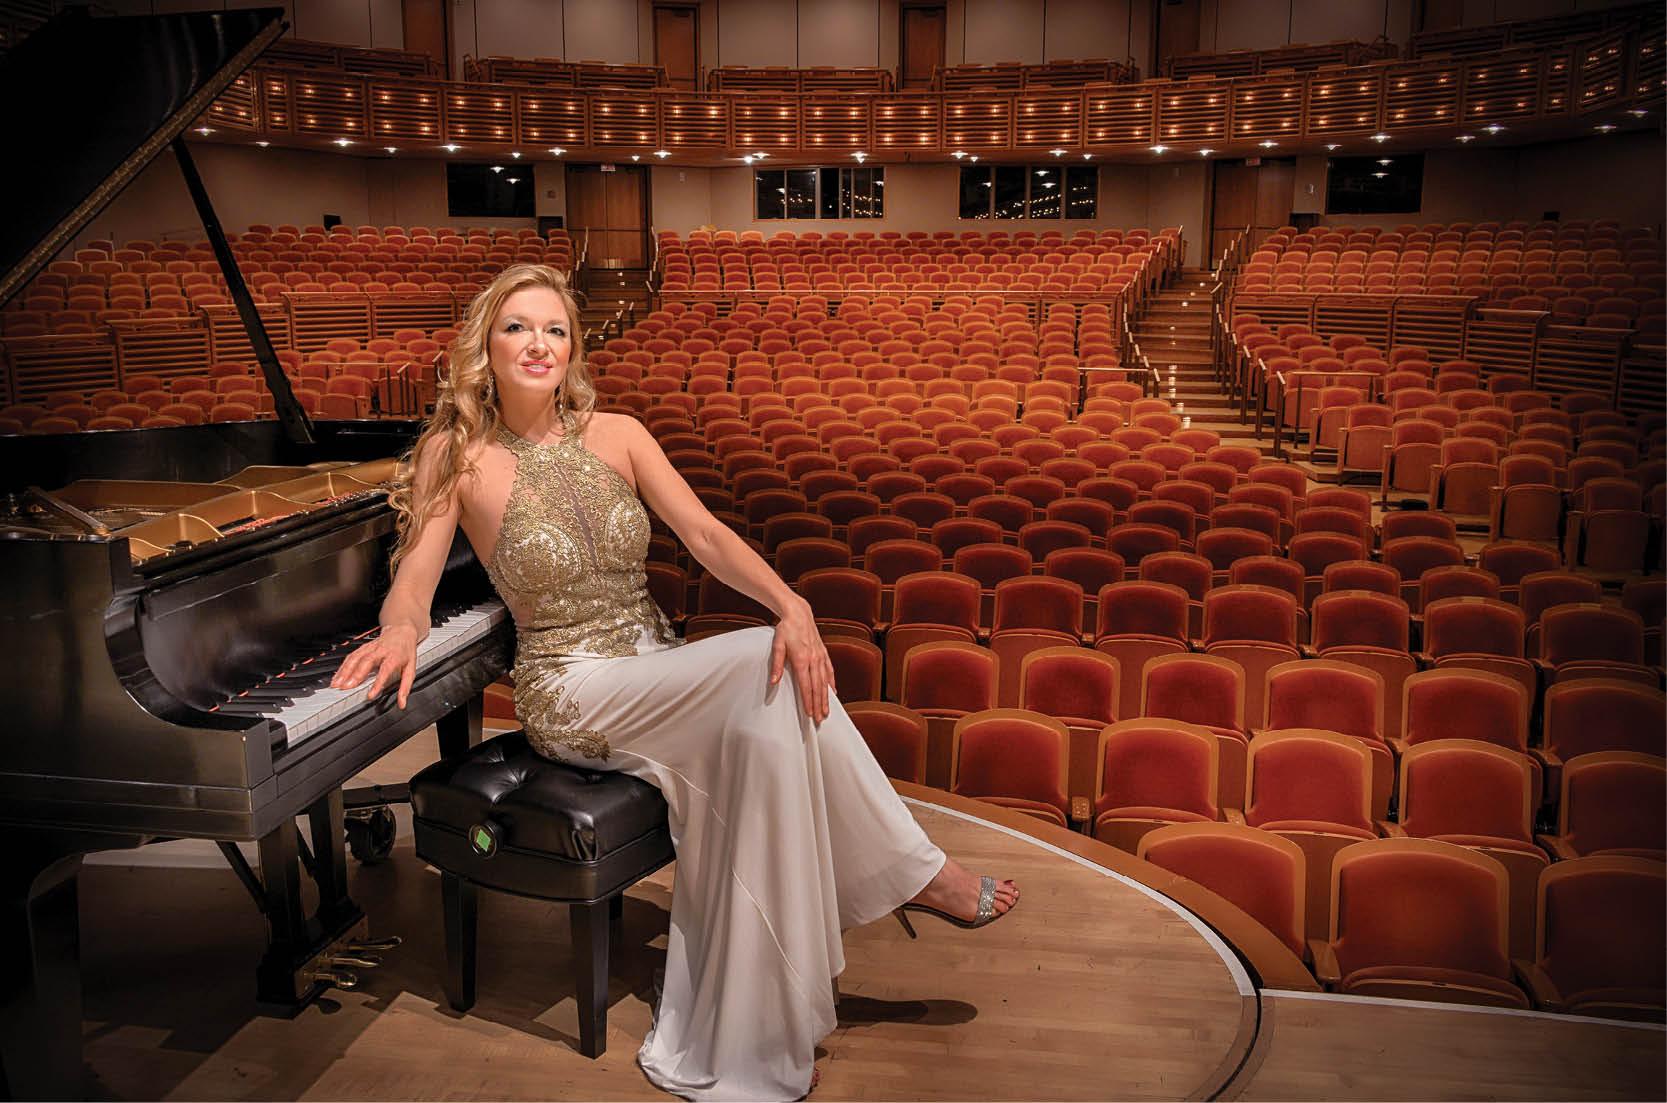 One-on-One with Pianist Svetlana Smolina